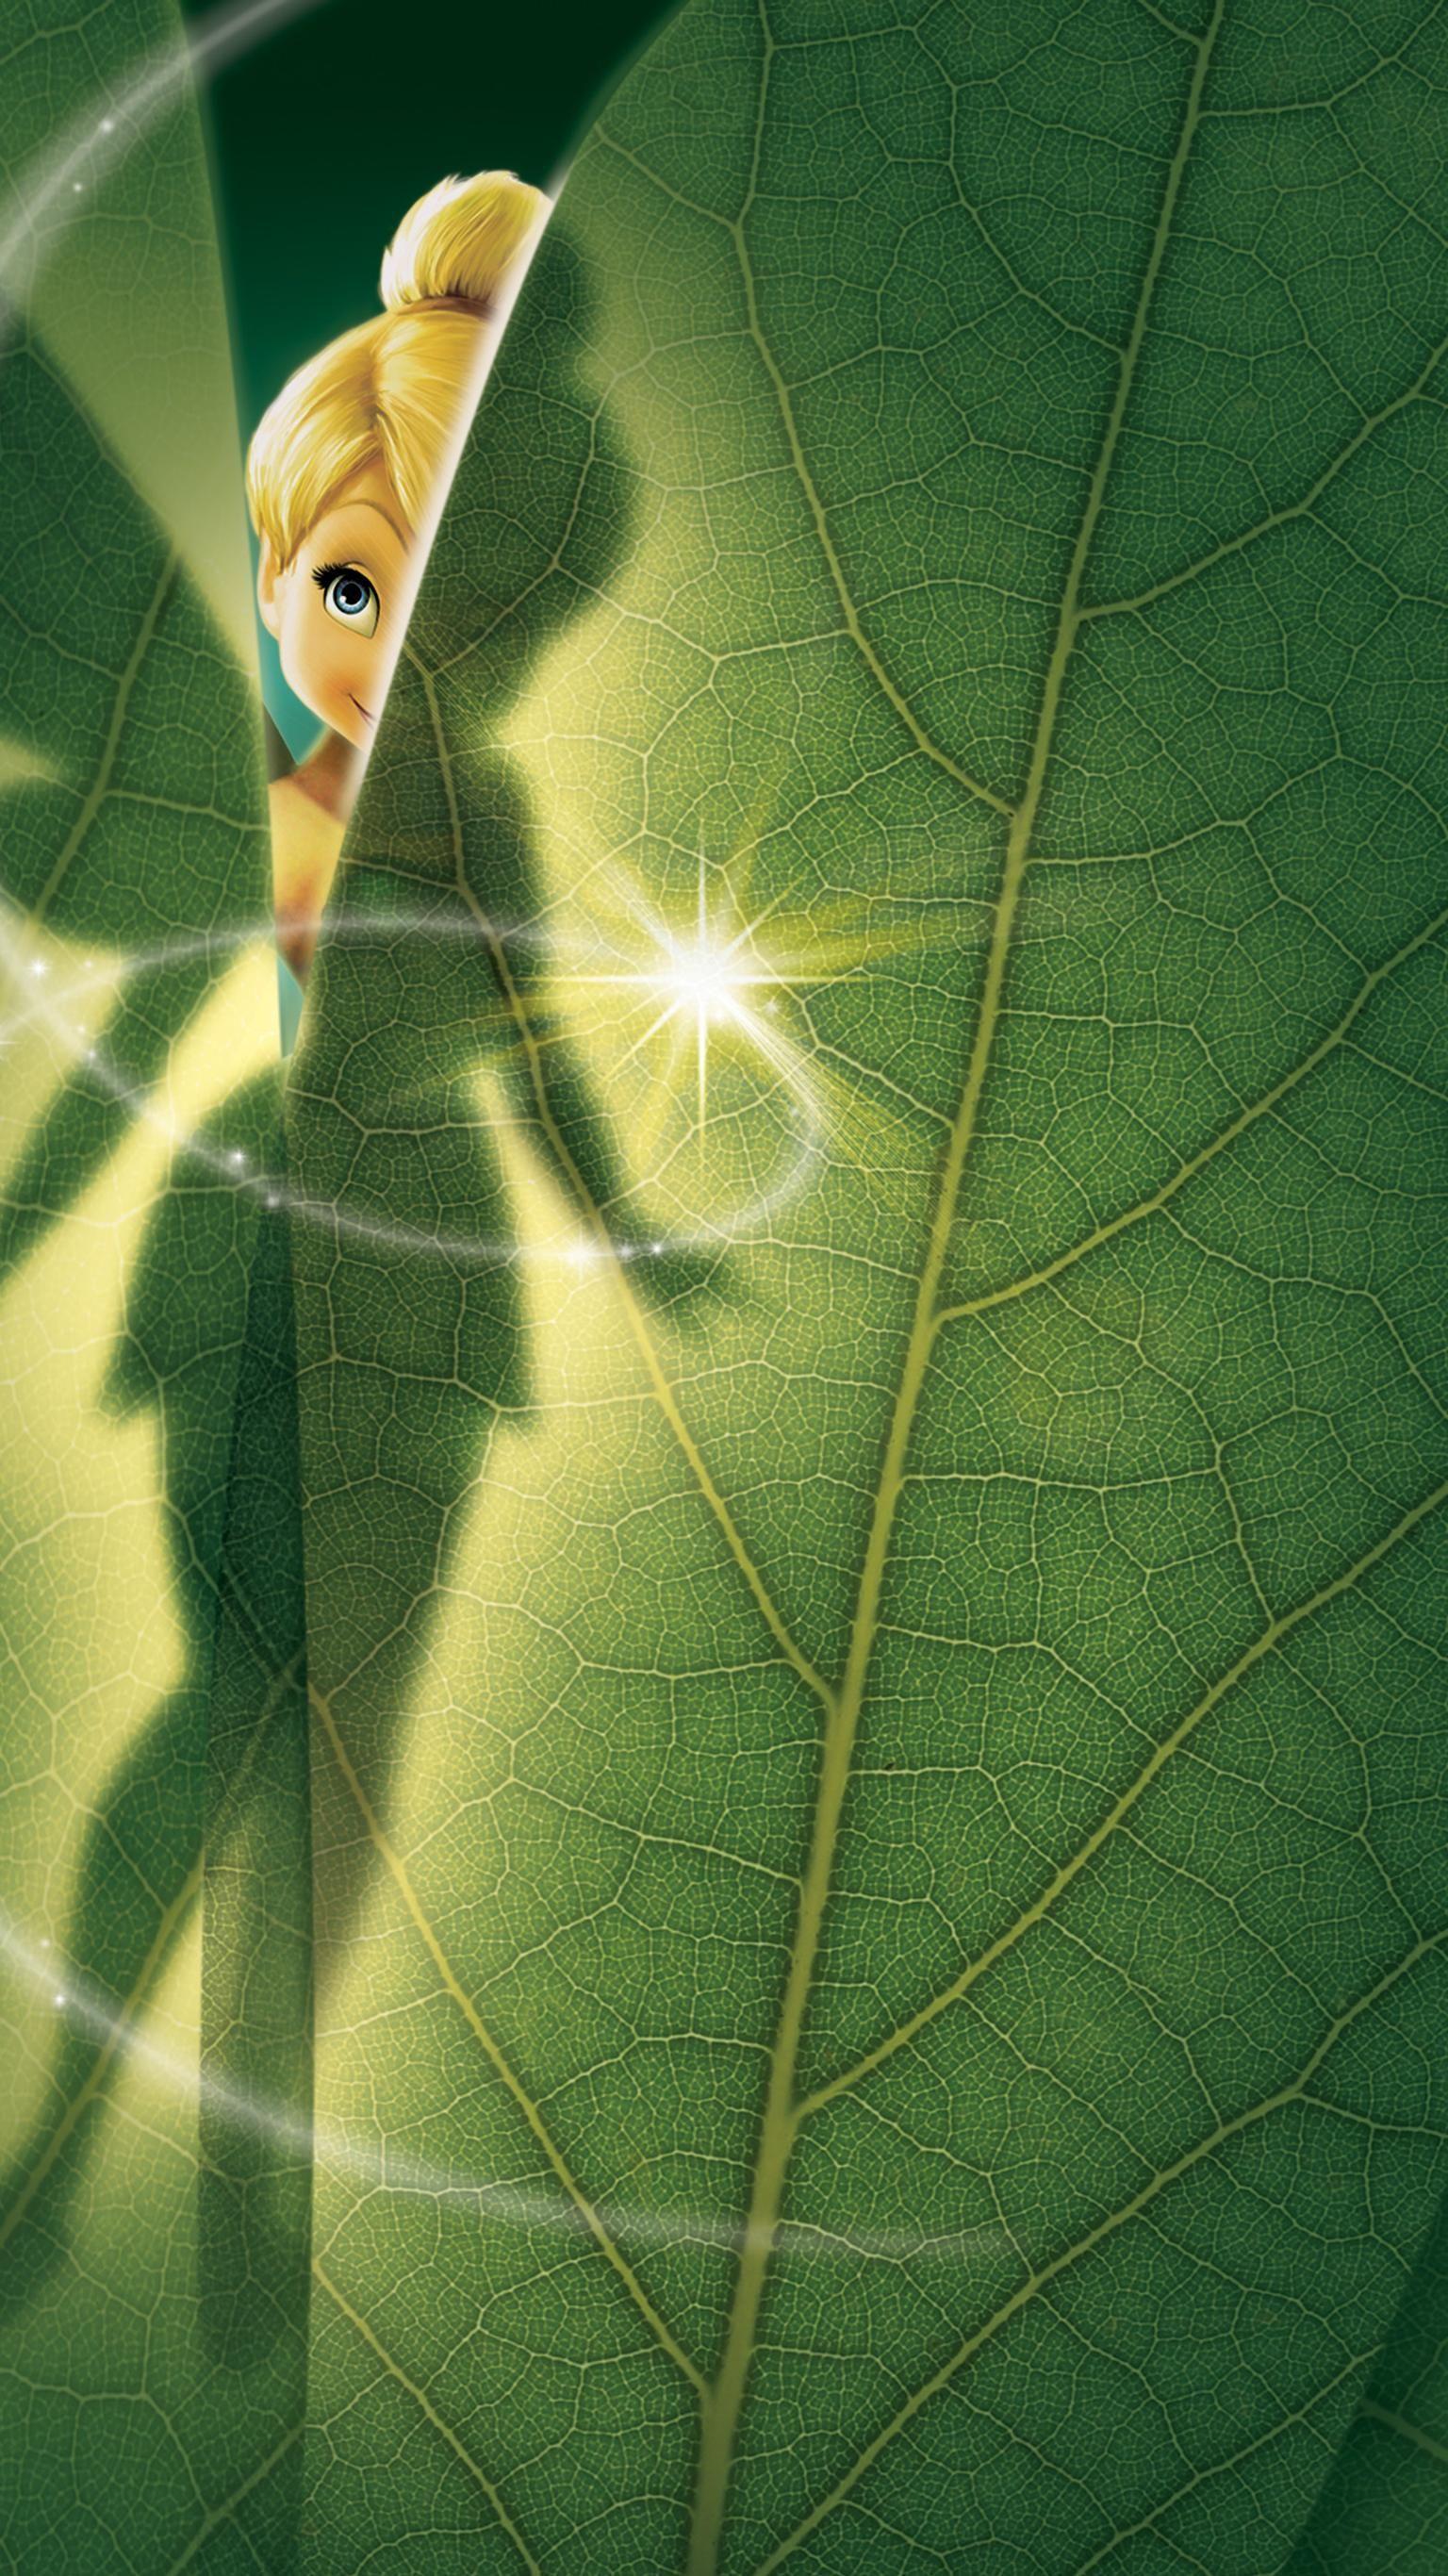 Tinker Bell 2008 Phone Wallpaper Disney Disney Cizimleri Tinkerbell Disney Sanati